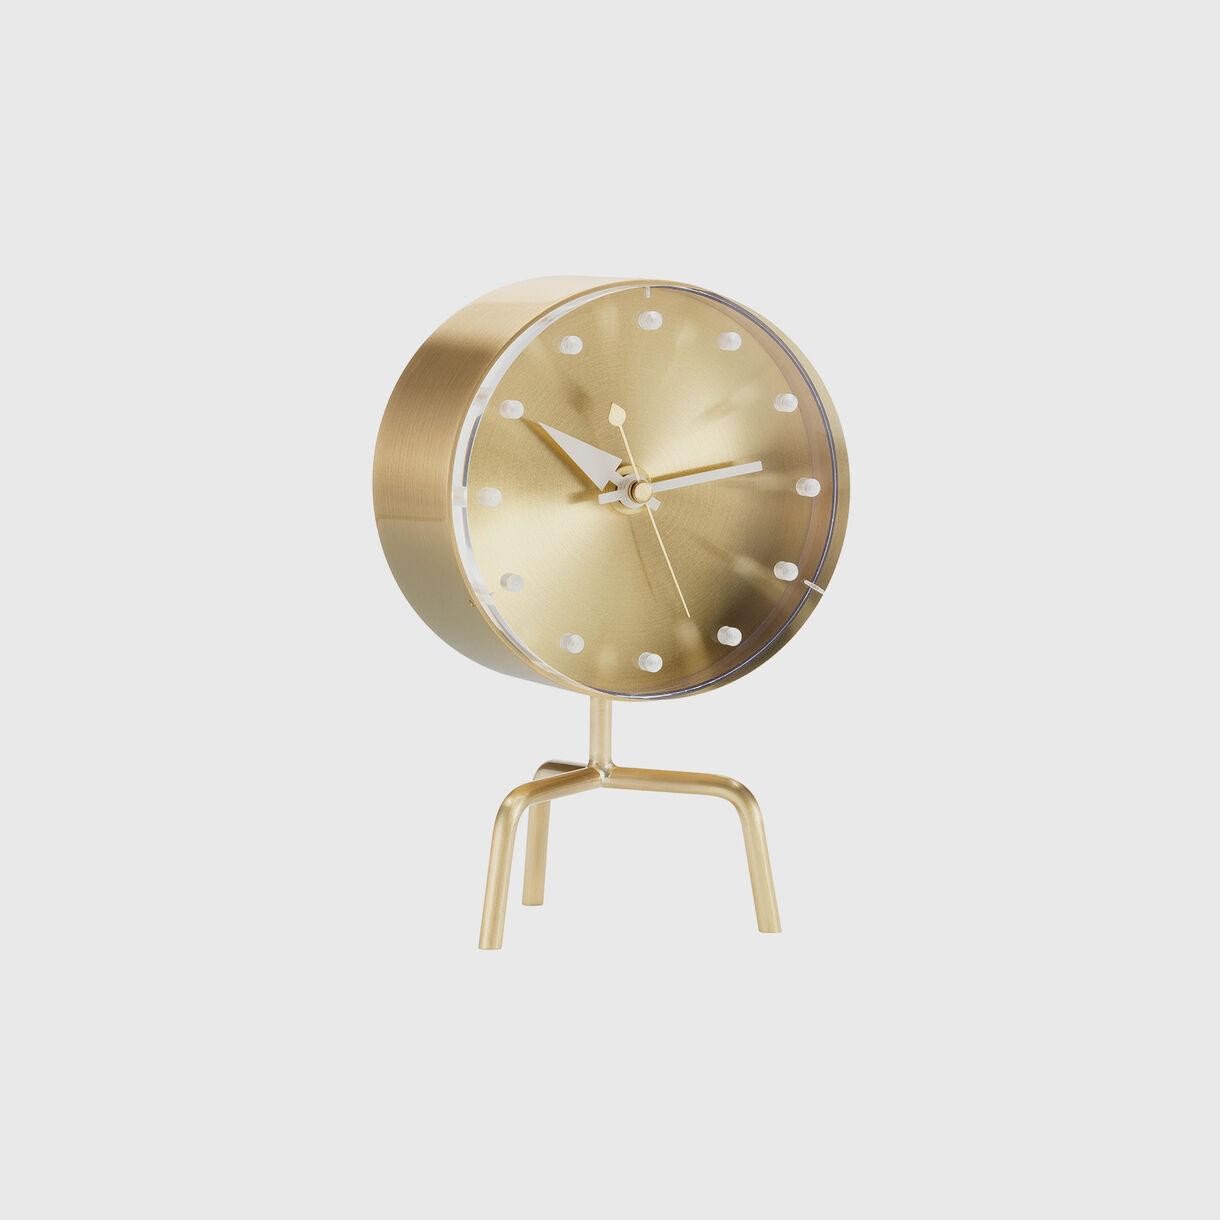 Tripod Desk Clock